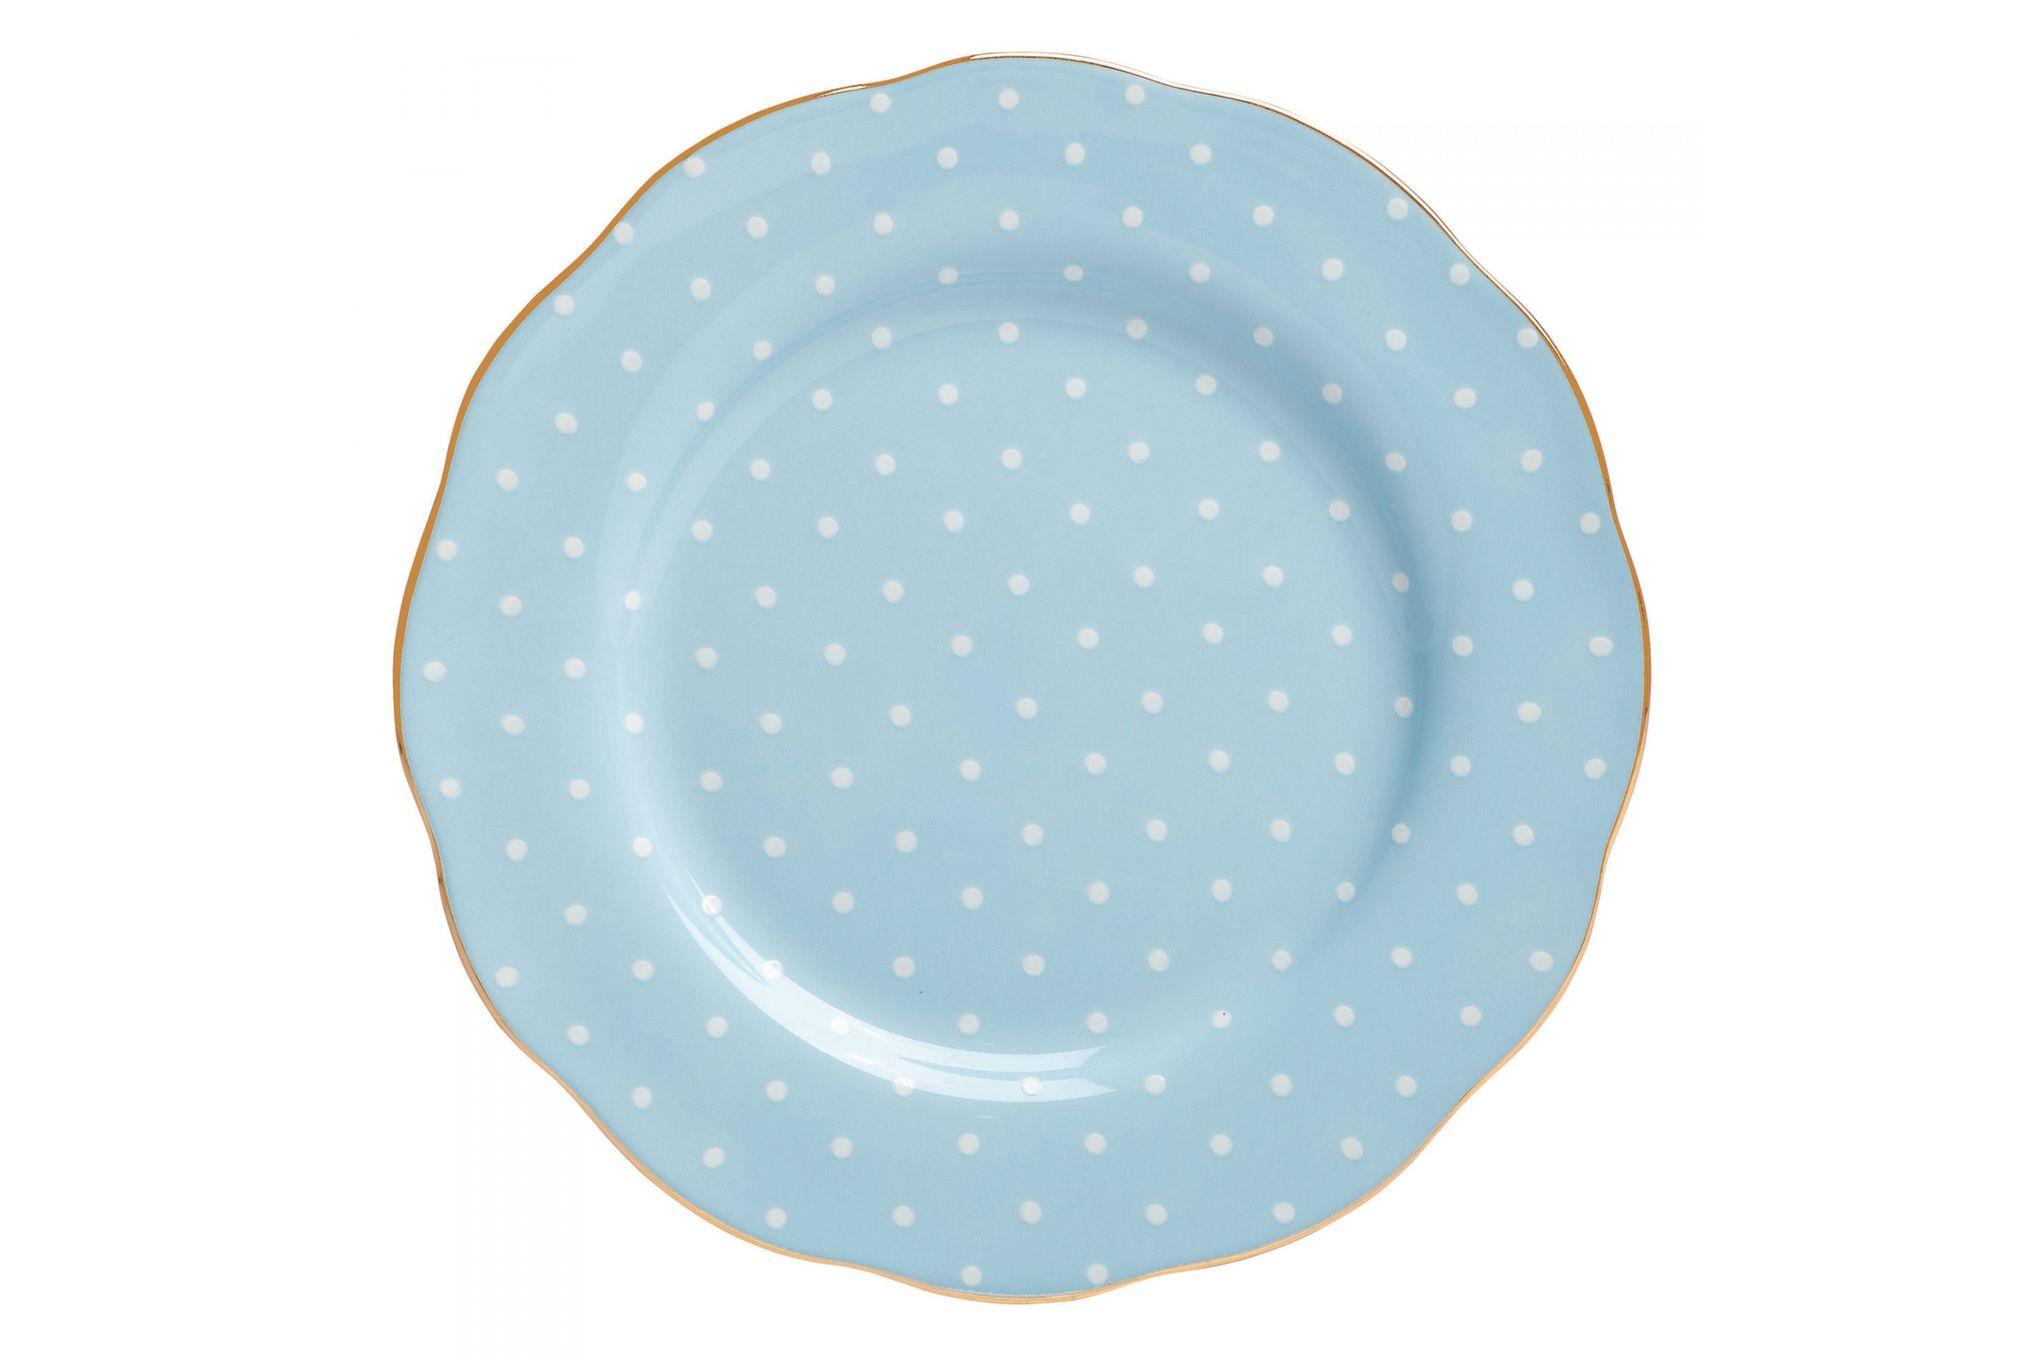 Royal Albert Polka Blue Side Plate 20cm thumb 1